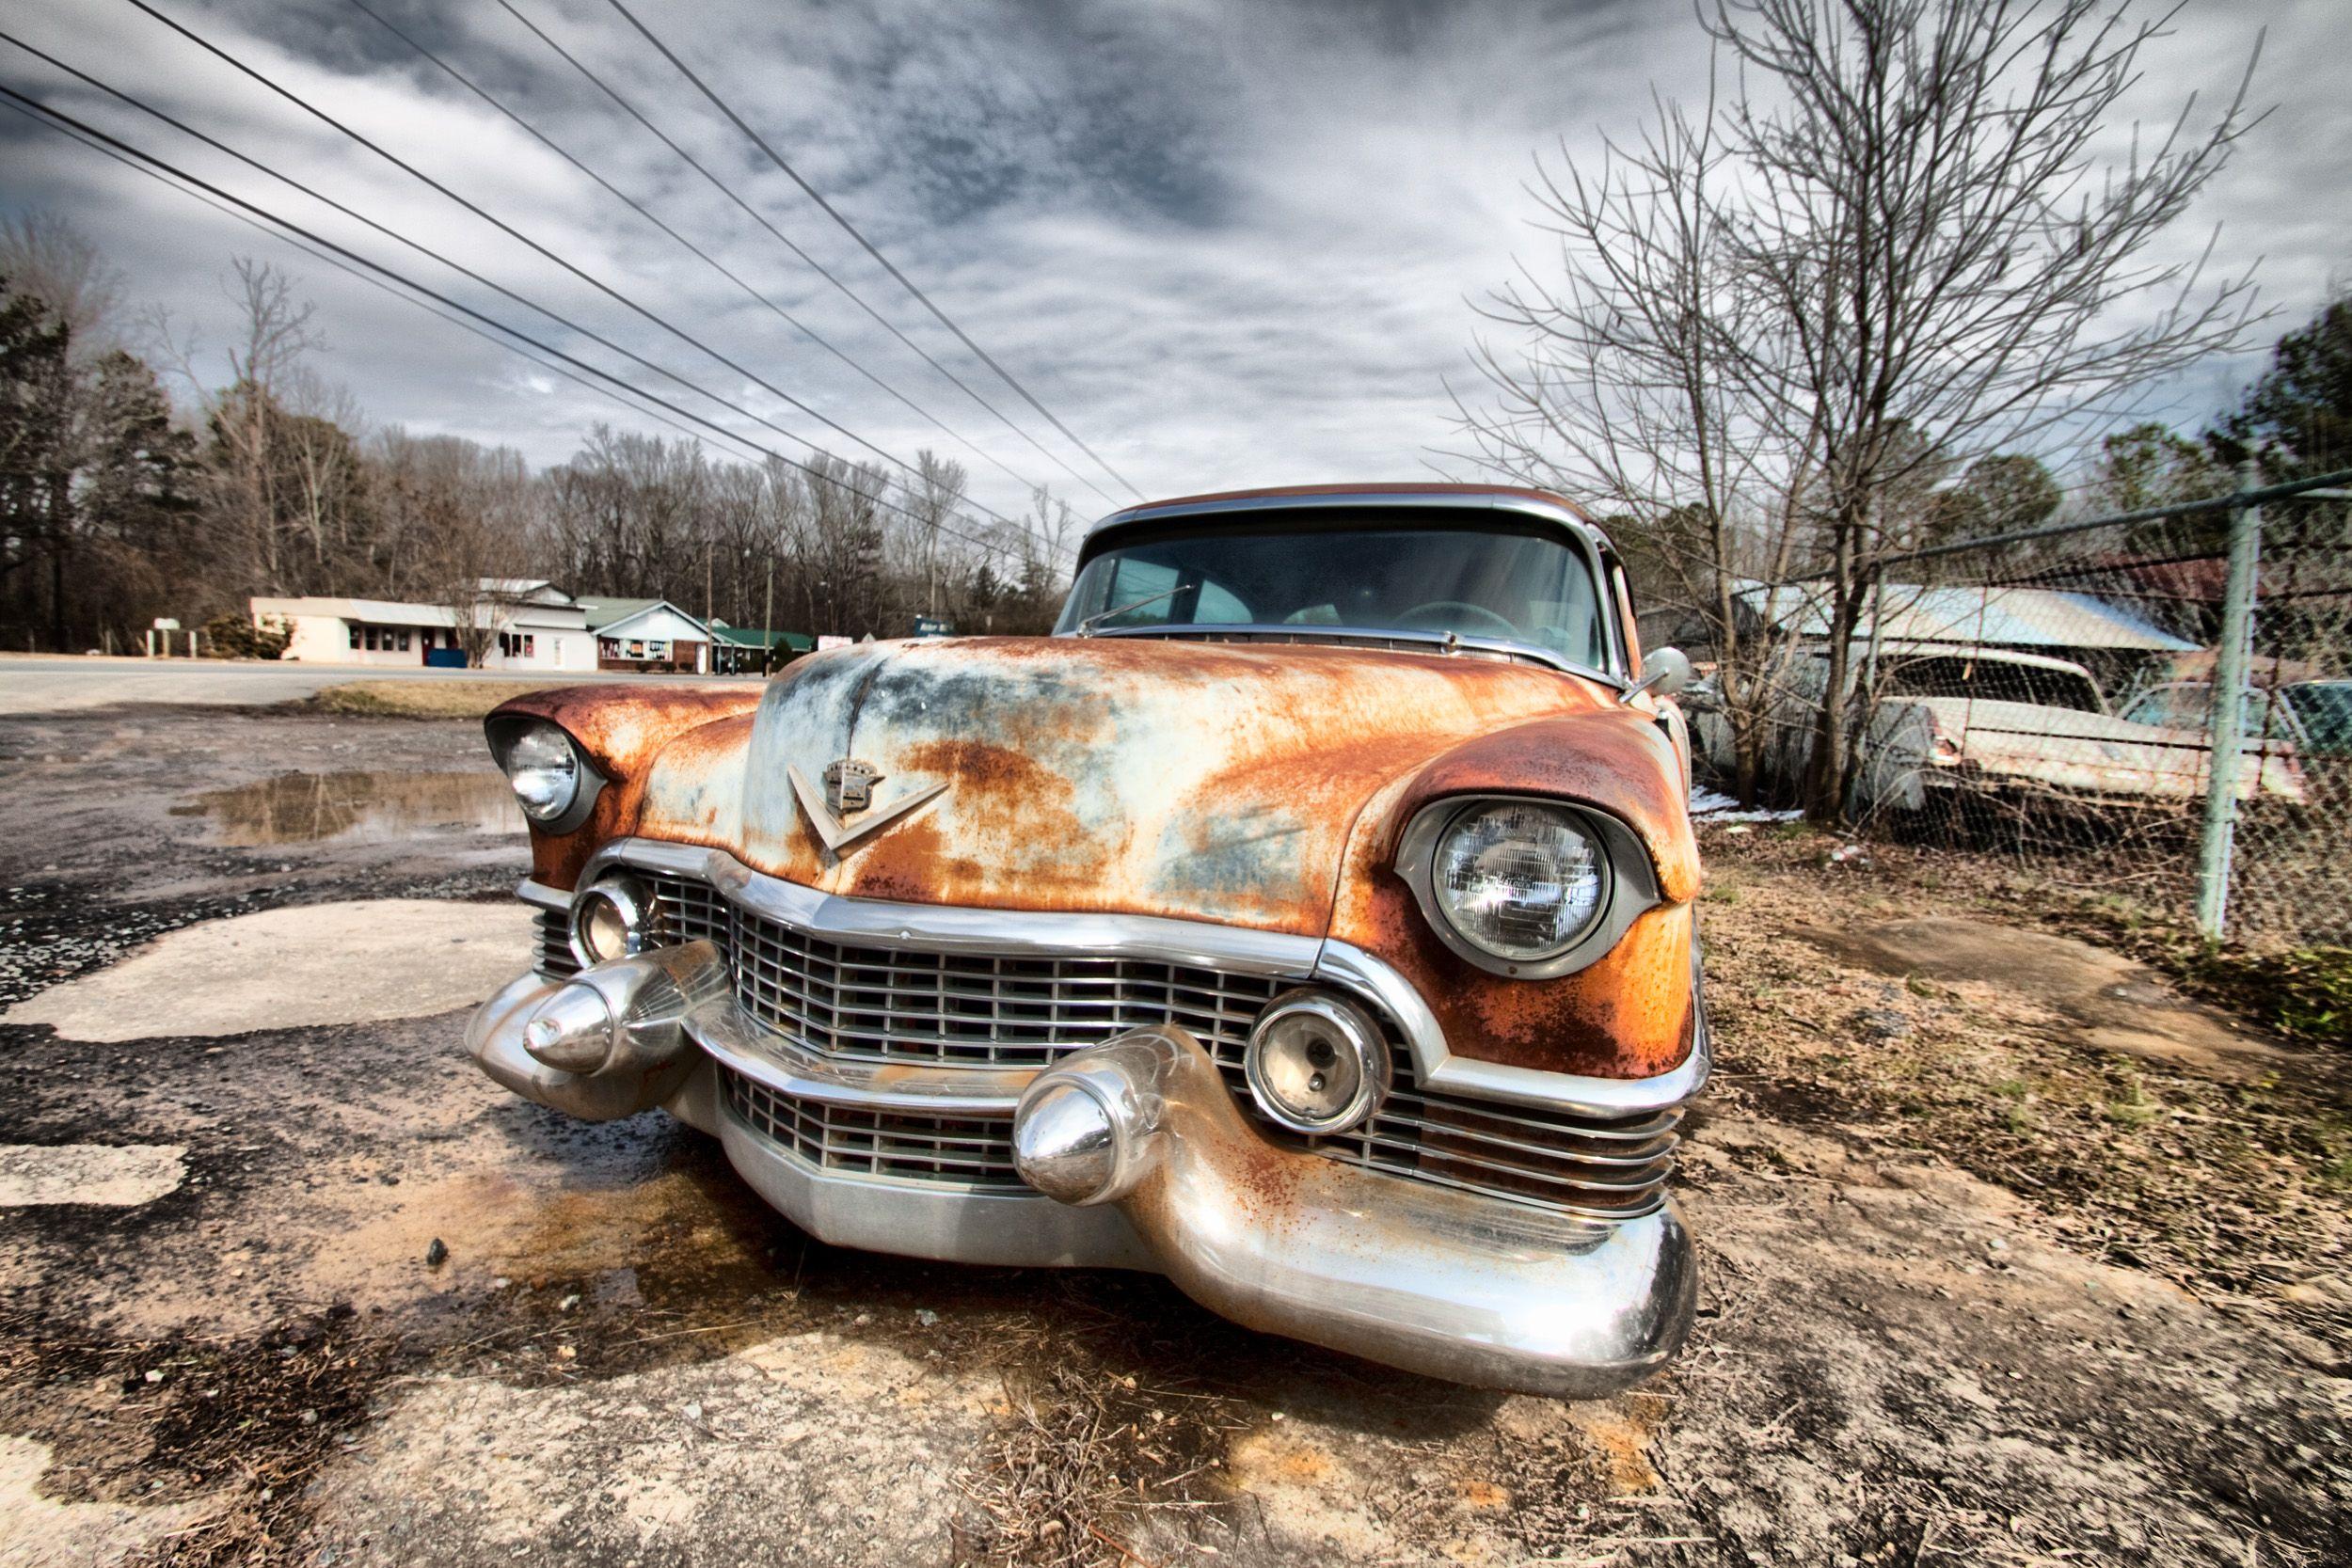 Old Cars Graveyard Classiccars Americancars Rusty Cars Car